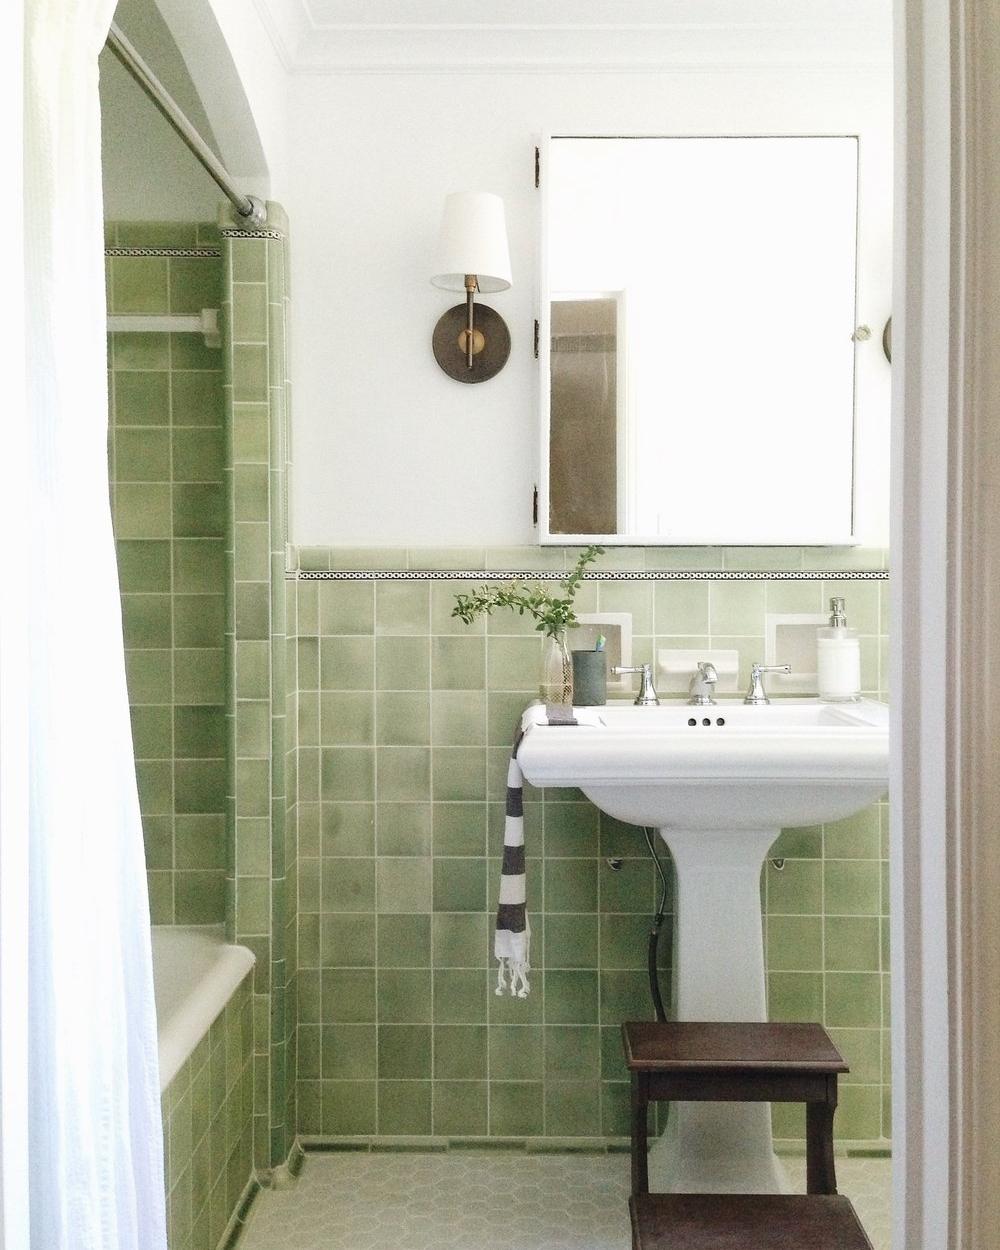 1927 WAGNER TUDOR – LITTLE GREEN BATHROOM